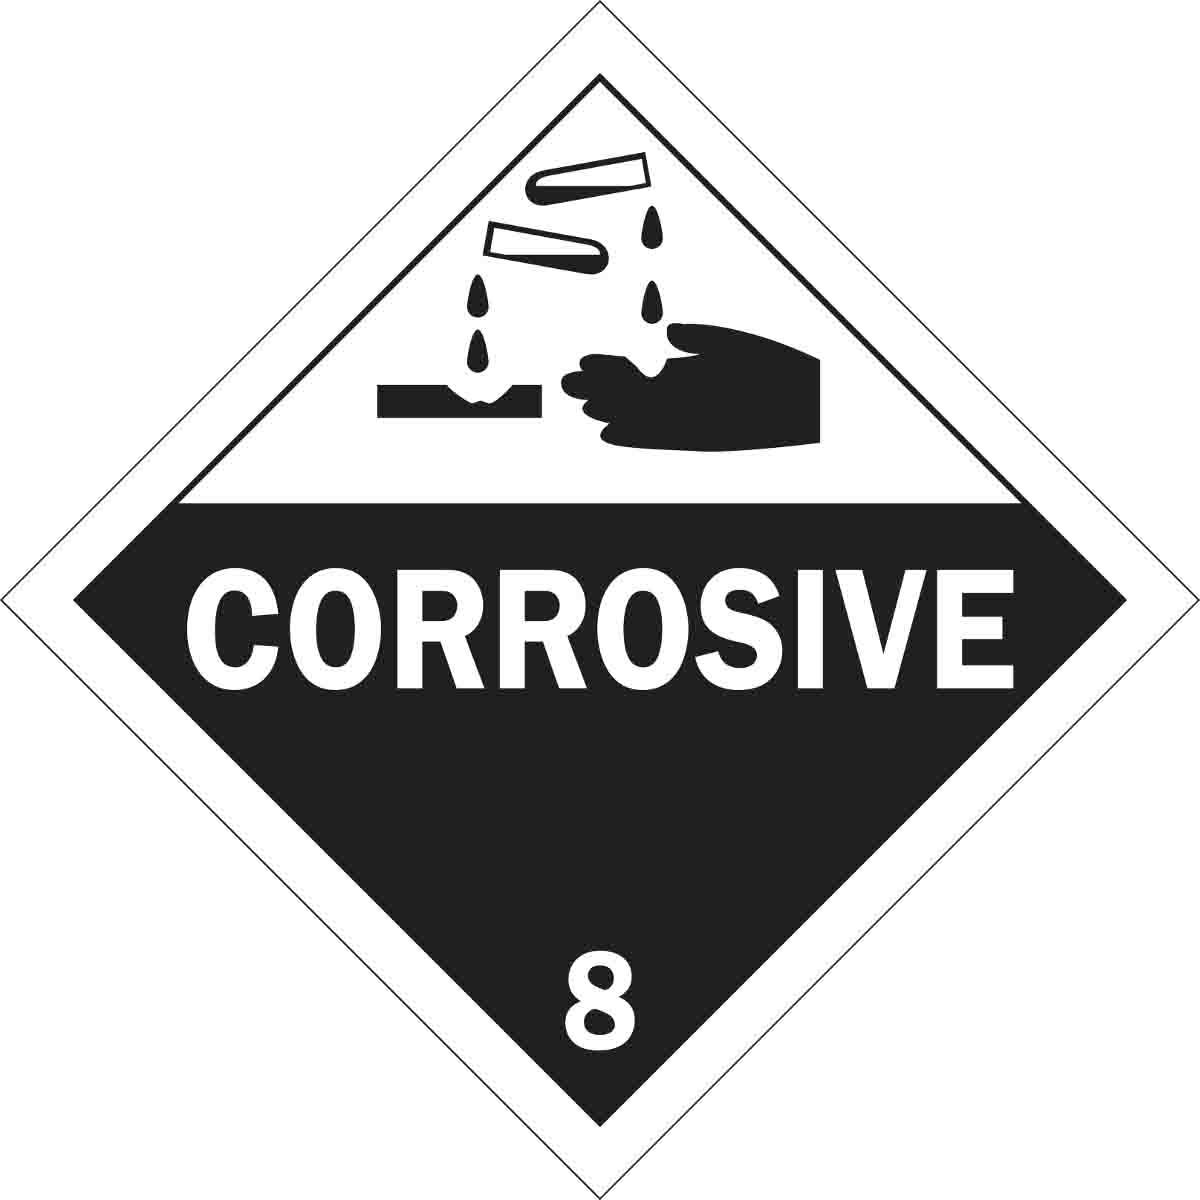 Brady® 63454 Diamond DOT Vehicle Placard Sign, CORROSIVE 8 Legend, Black on White, 10-3/4 in H, B-101 Polycoated Tagstock